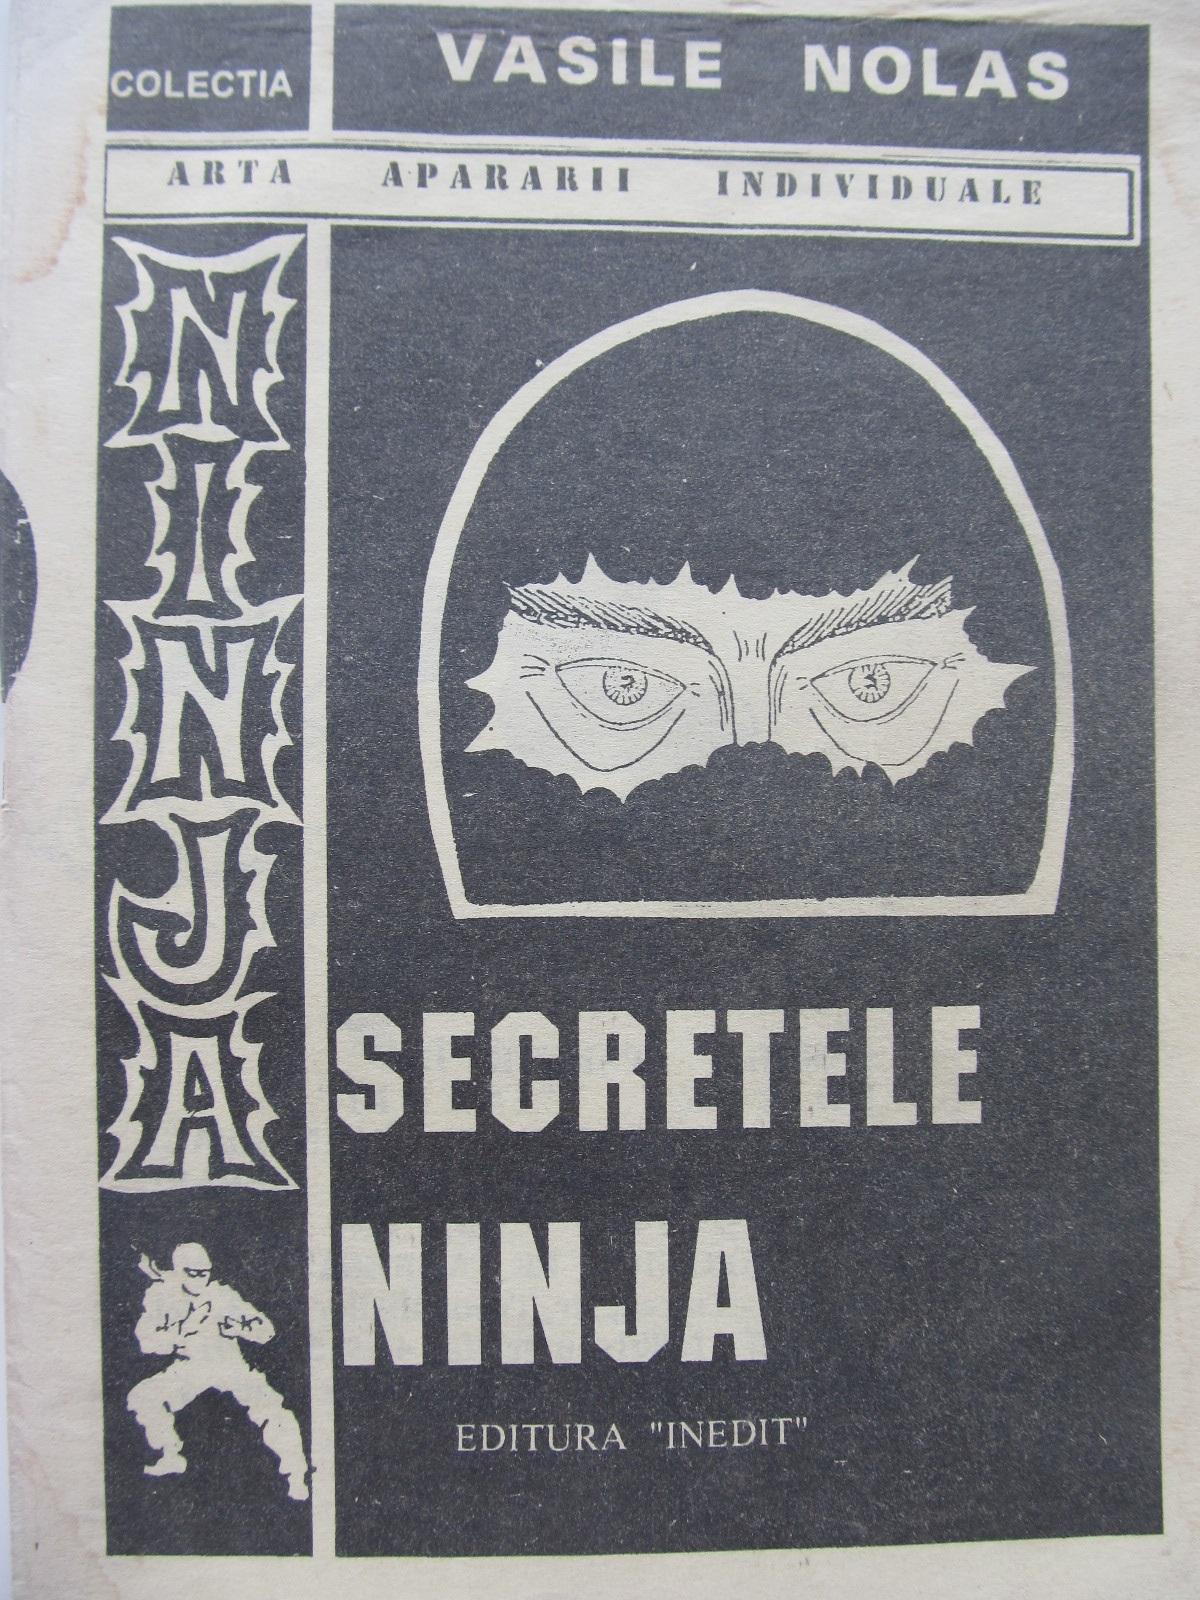 Secretele ninja - Vasile Nolas | Detalii carte